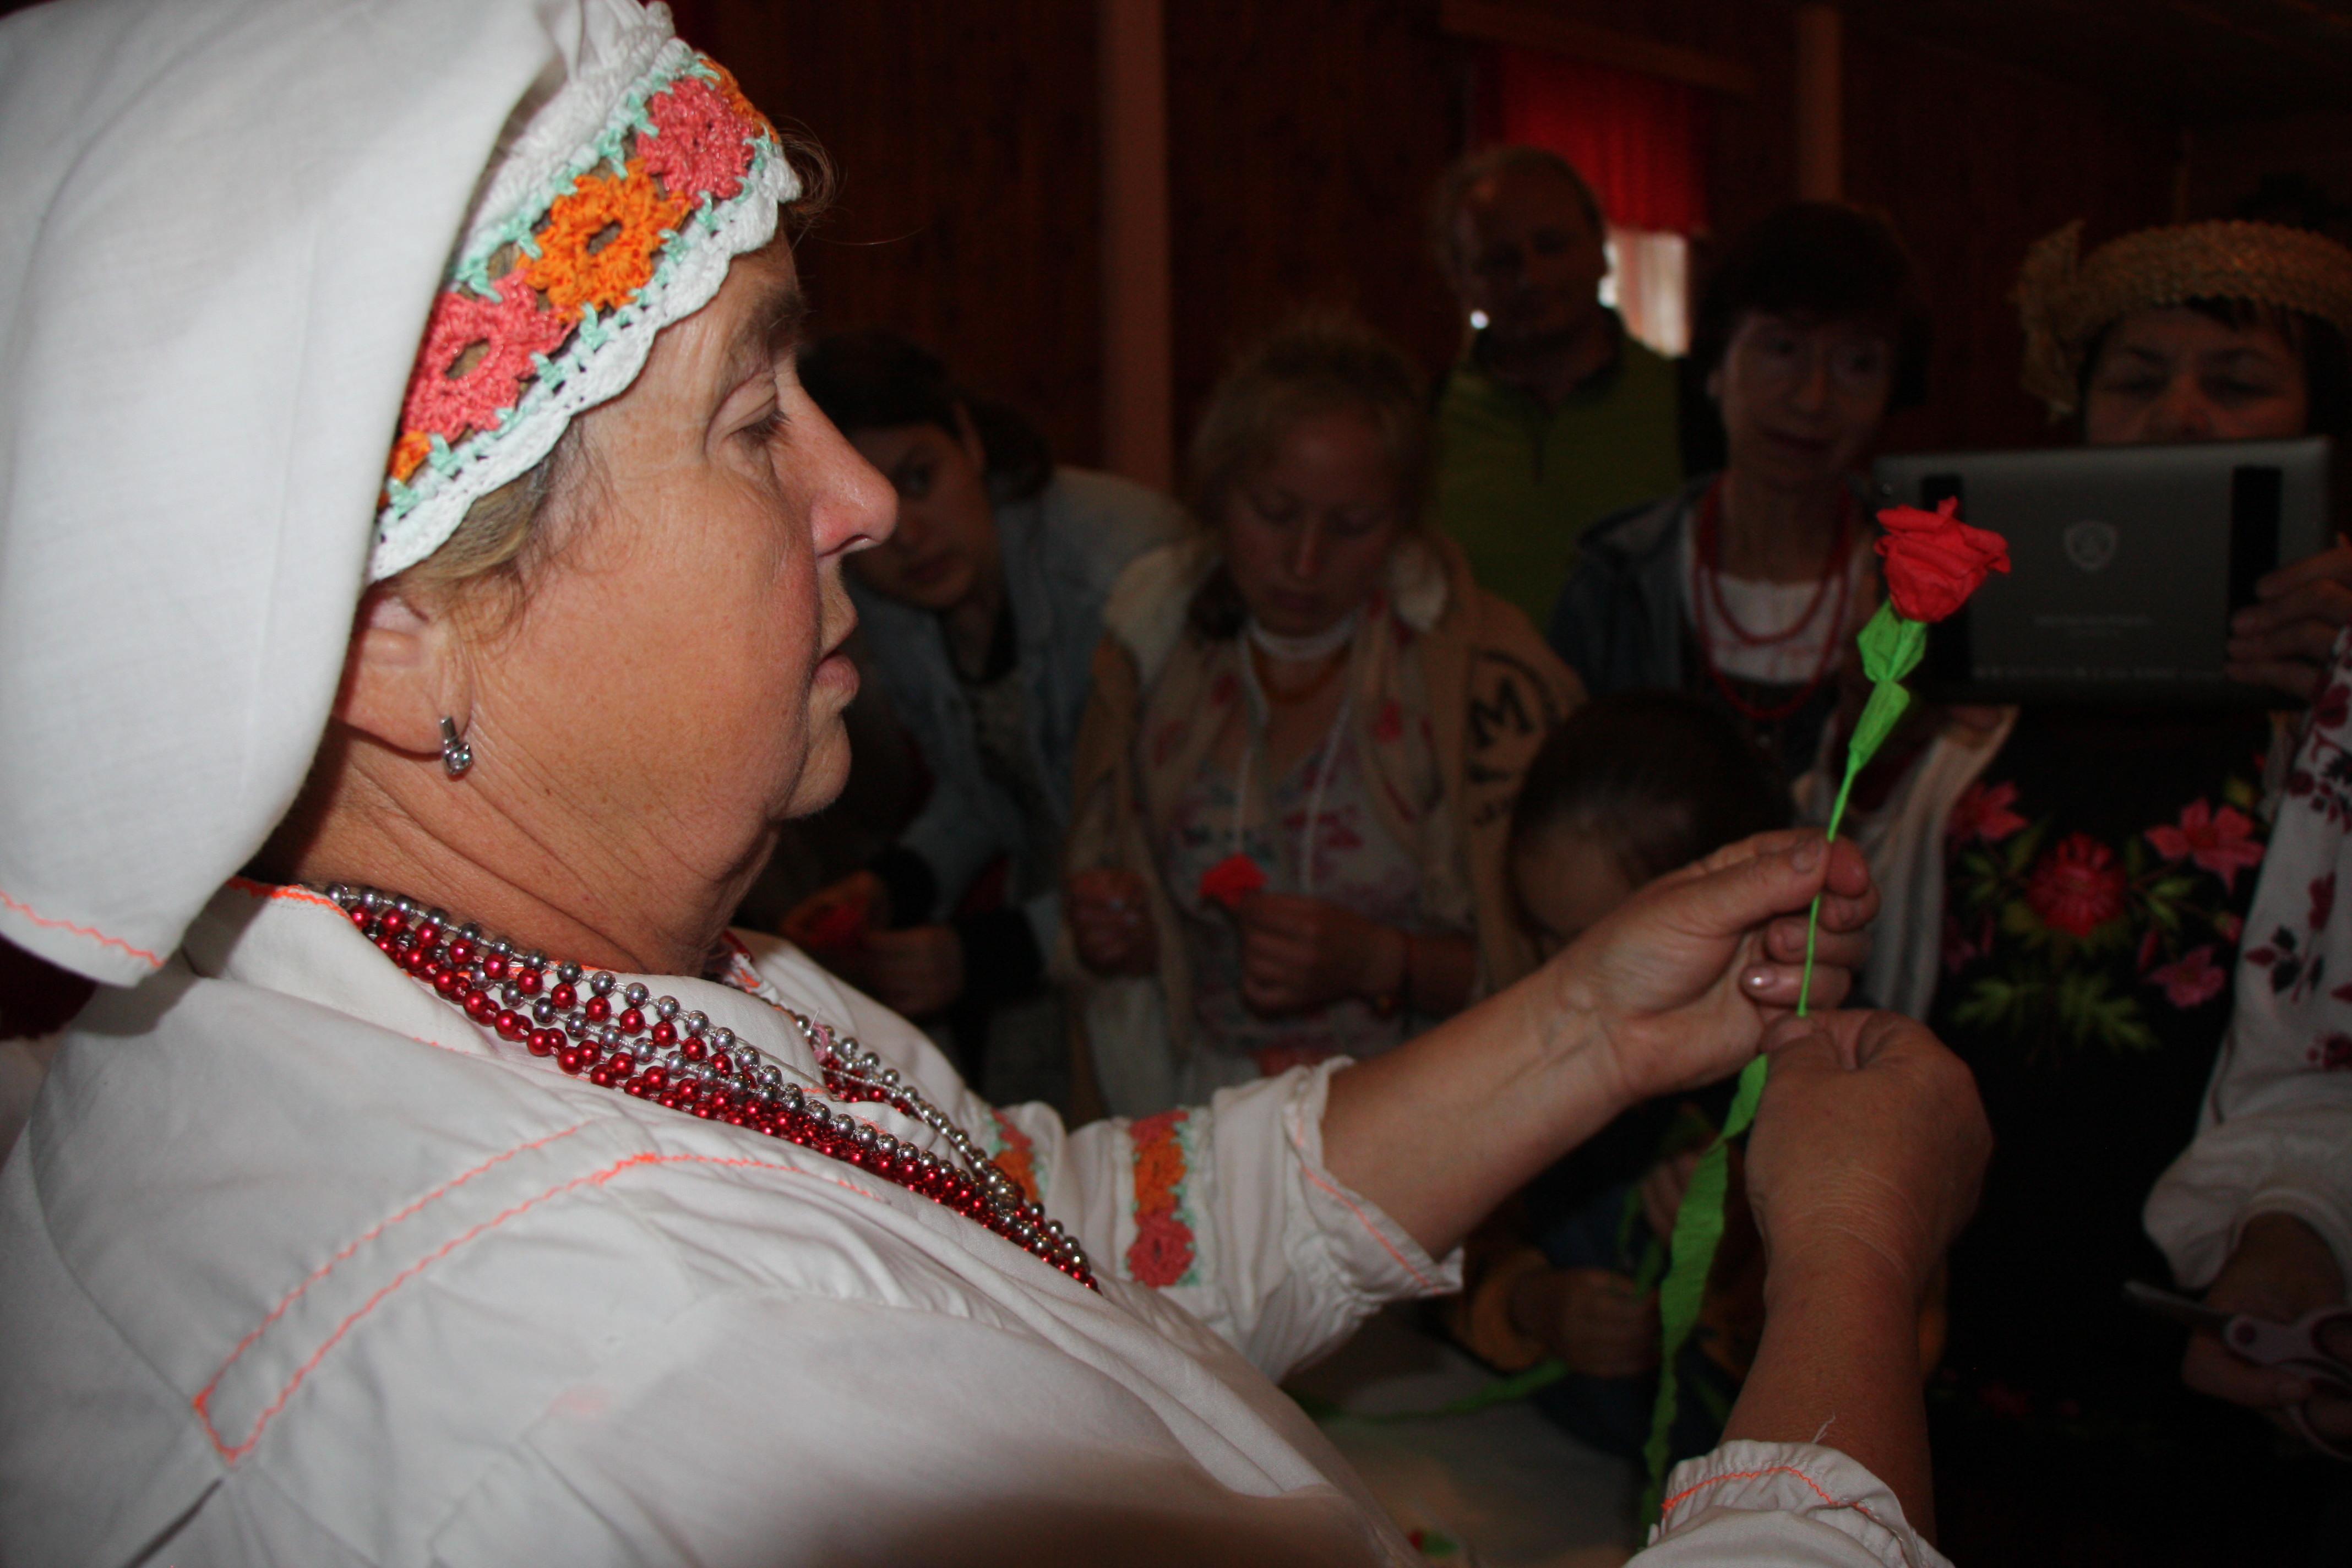 Р.Валькова-народны-майстар-вясельных-вянкоў-фота-Н.Бацілавай